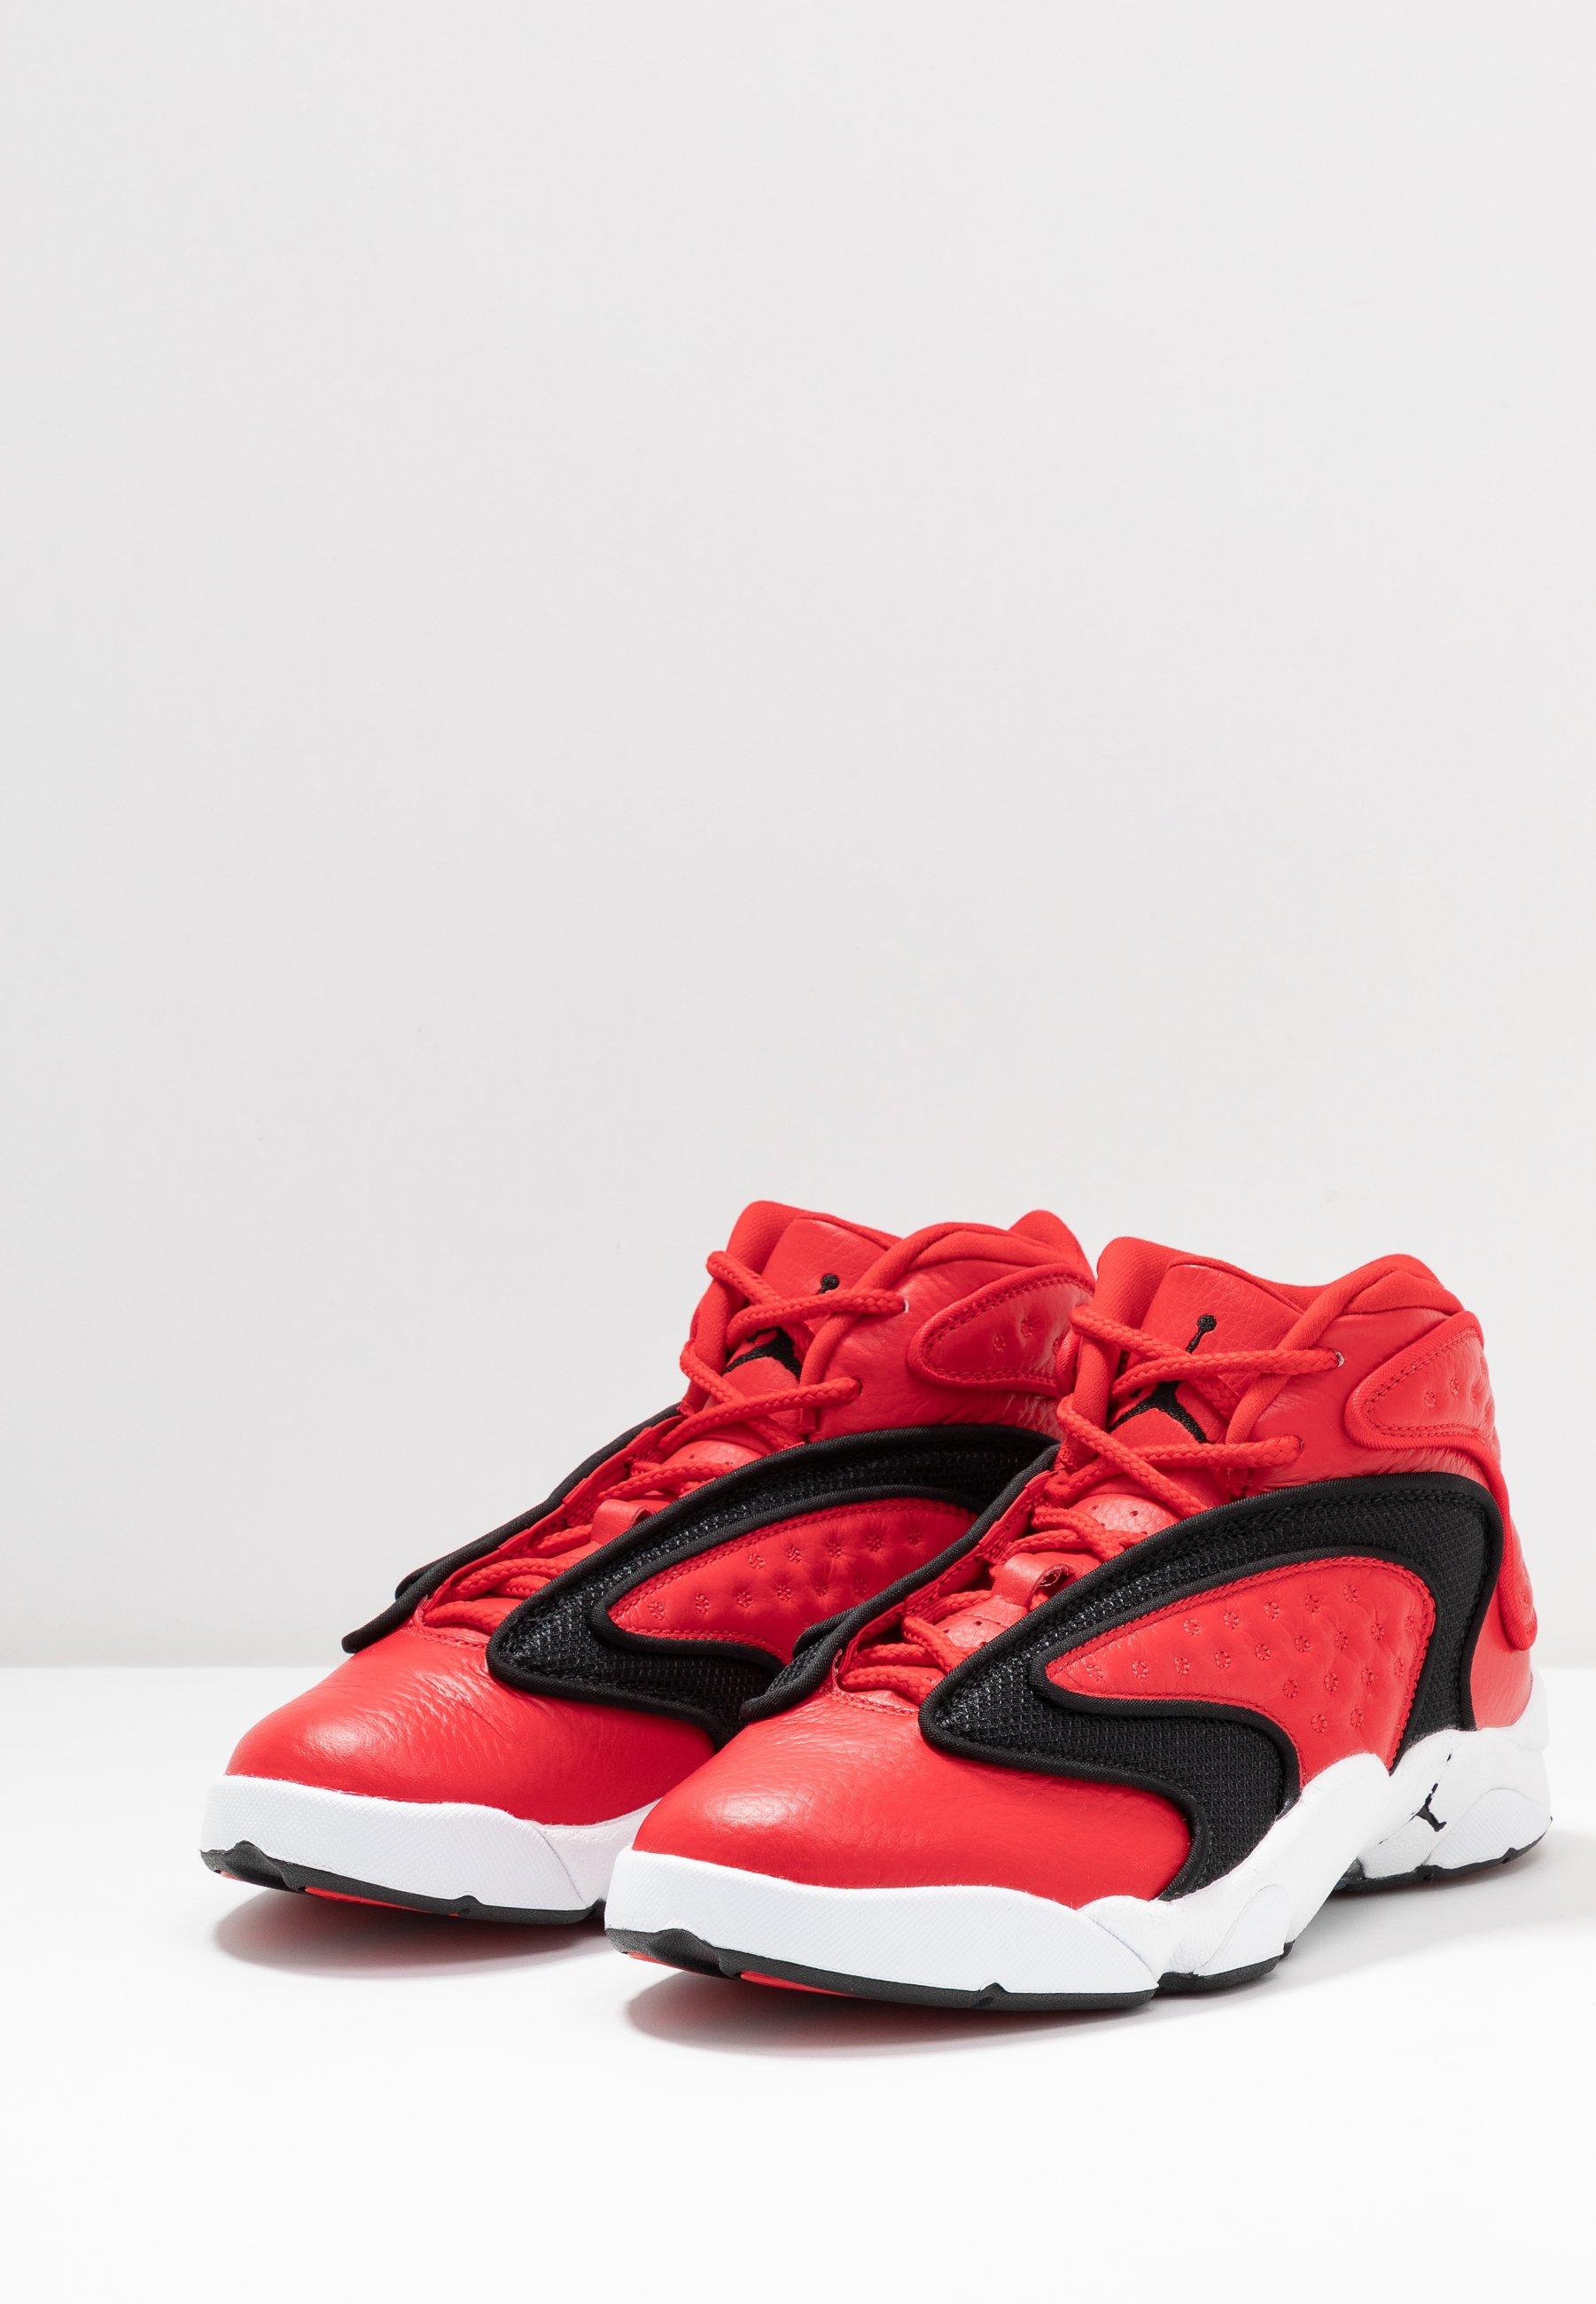 Air Jordan OG Damenschuh Baskets montantes university redblackwhitemetallic silver